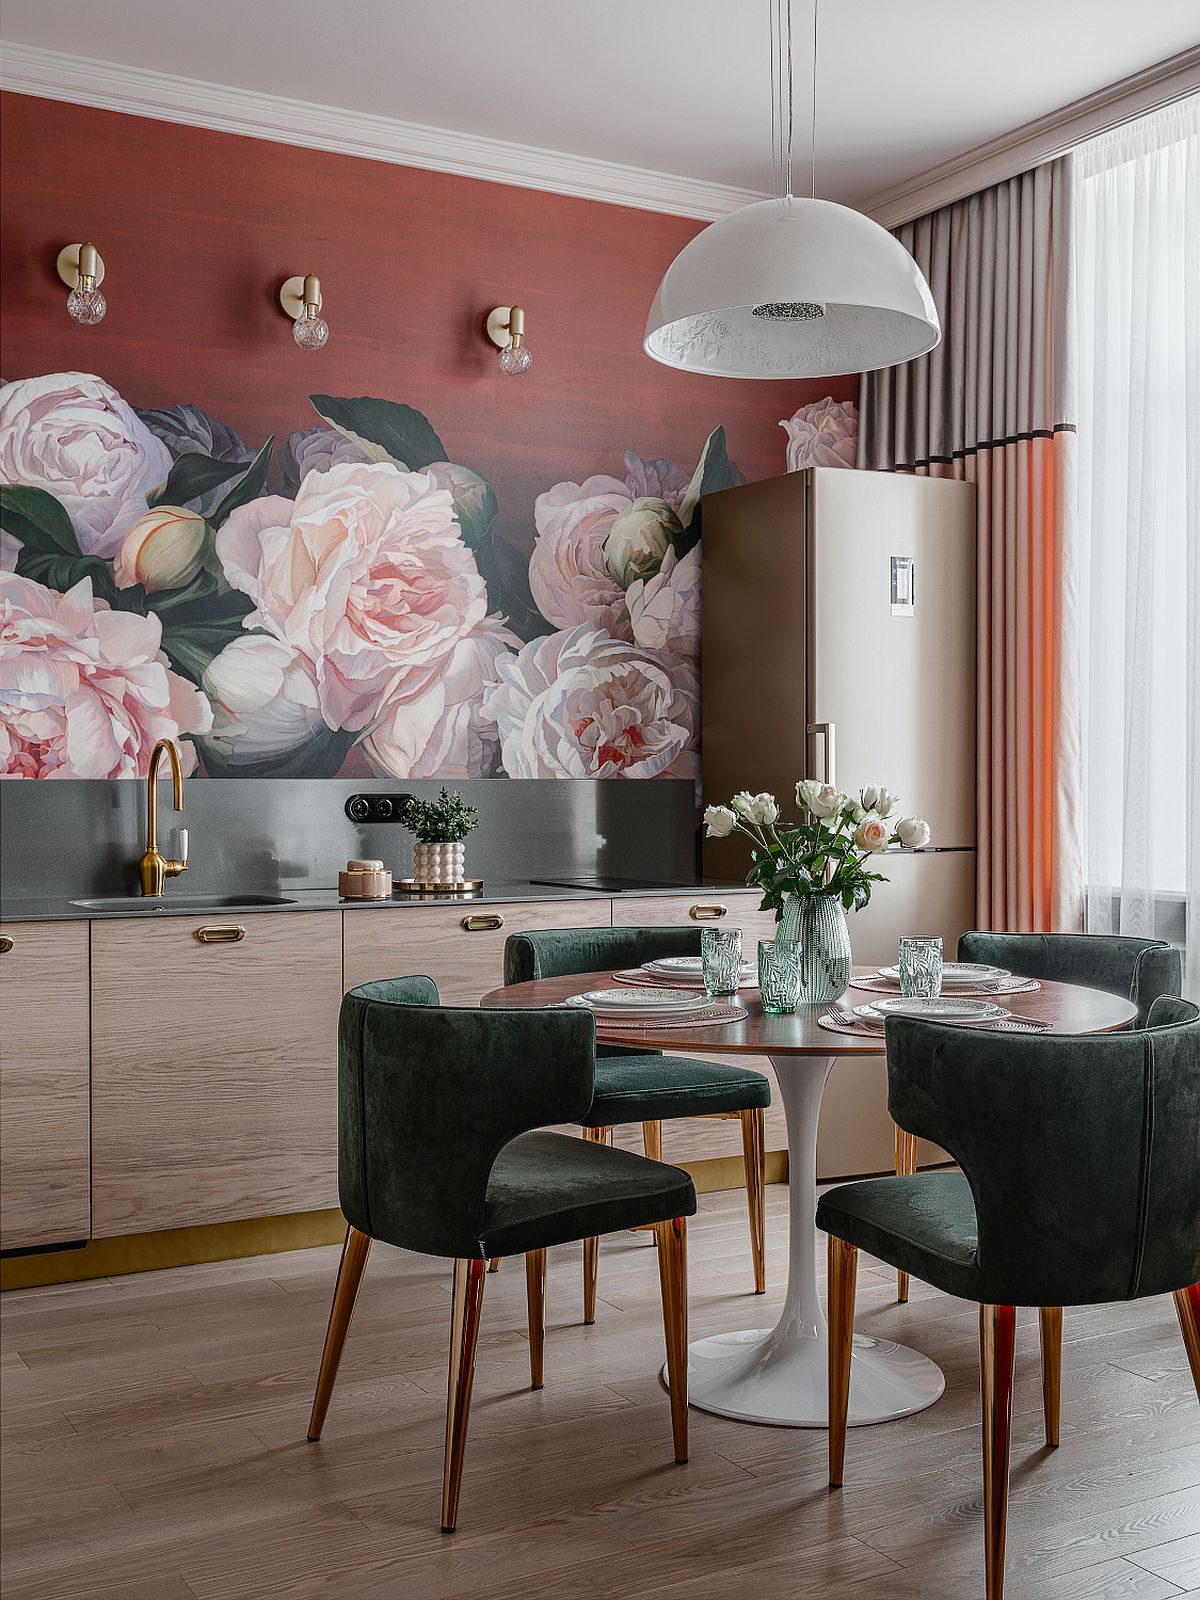 adelaparvu.com despre bucatarie cu tapet cu flori, designer Iulia Sheypunas, foto Vladimir Barabash (3)